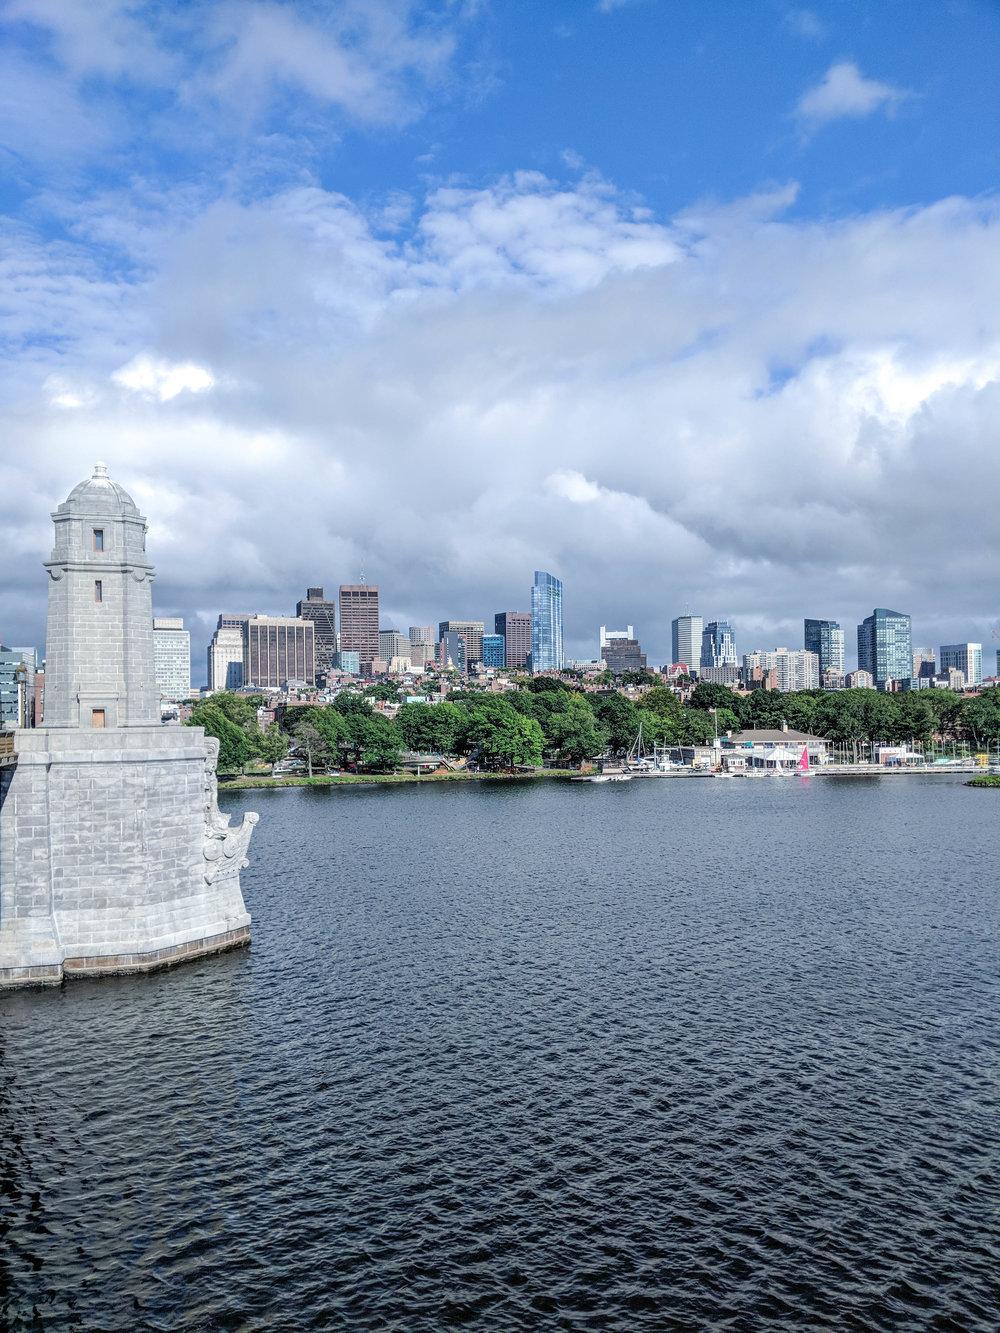 bri rinehart; photography; boston; city; skyline